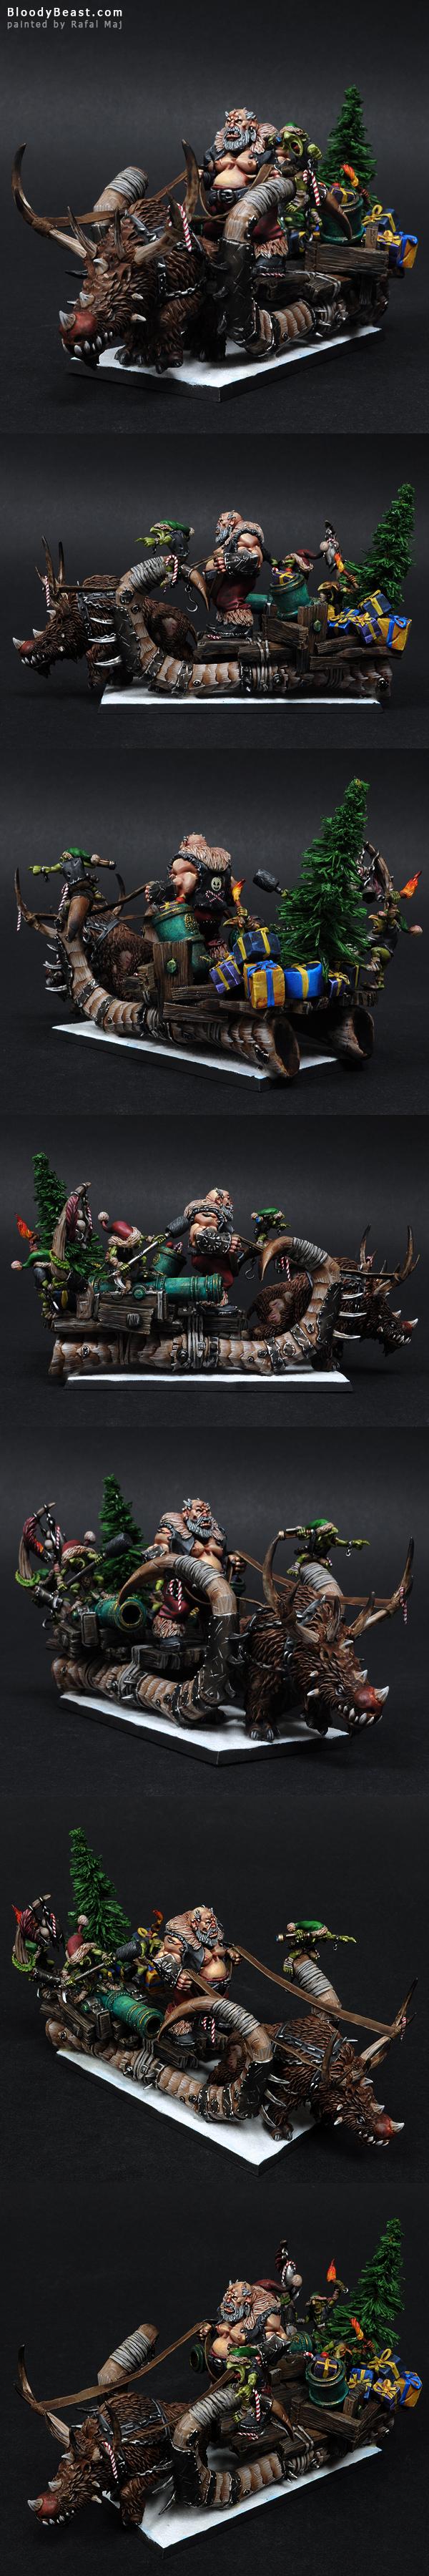 Badass Santa Ogre painted by Rafal Maj (BloodyBeast.com)